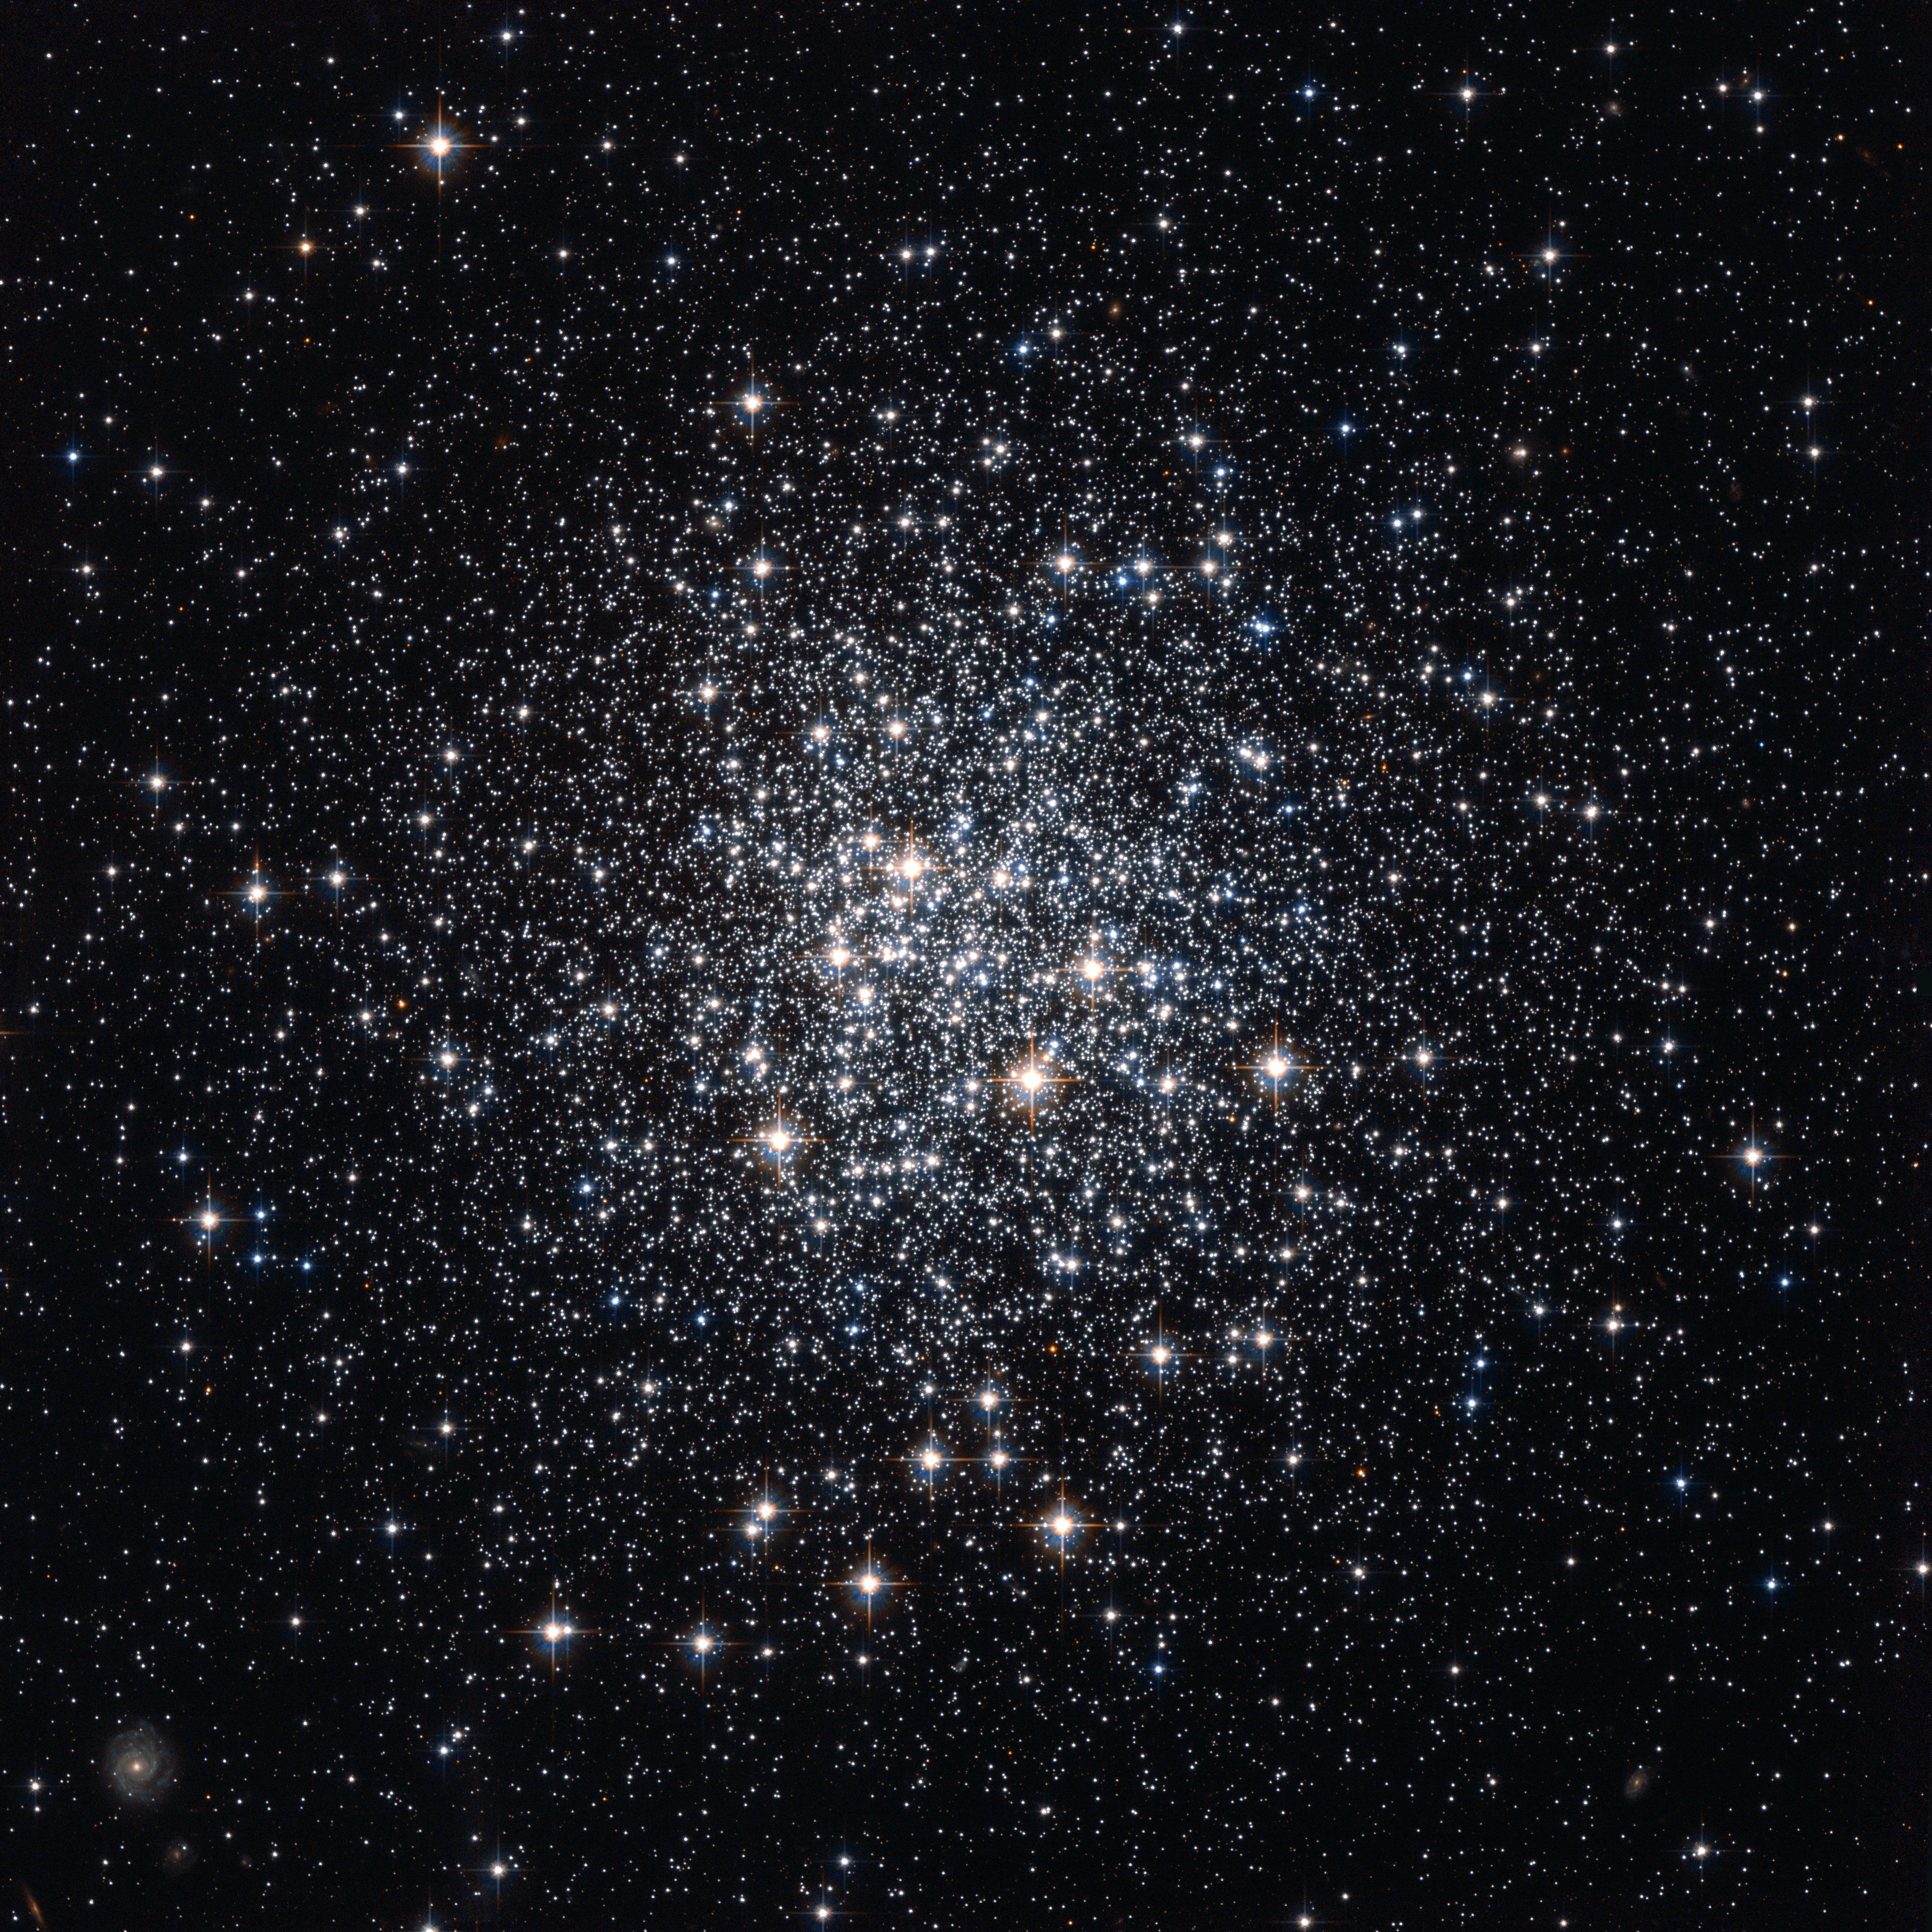 star clusters milky way galaxy - photo #11